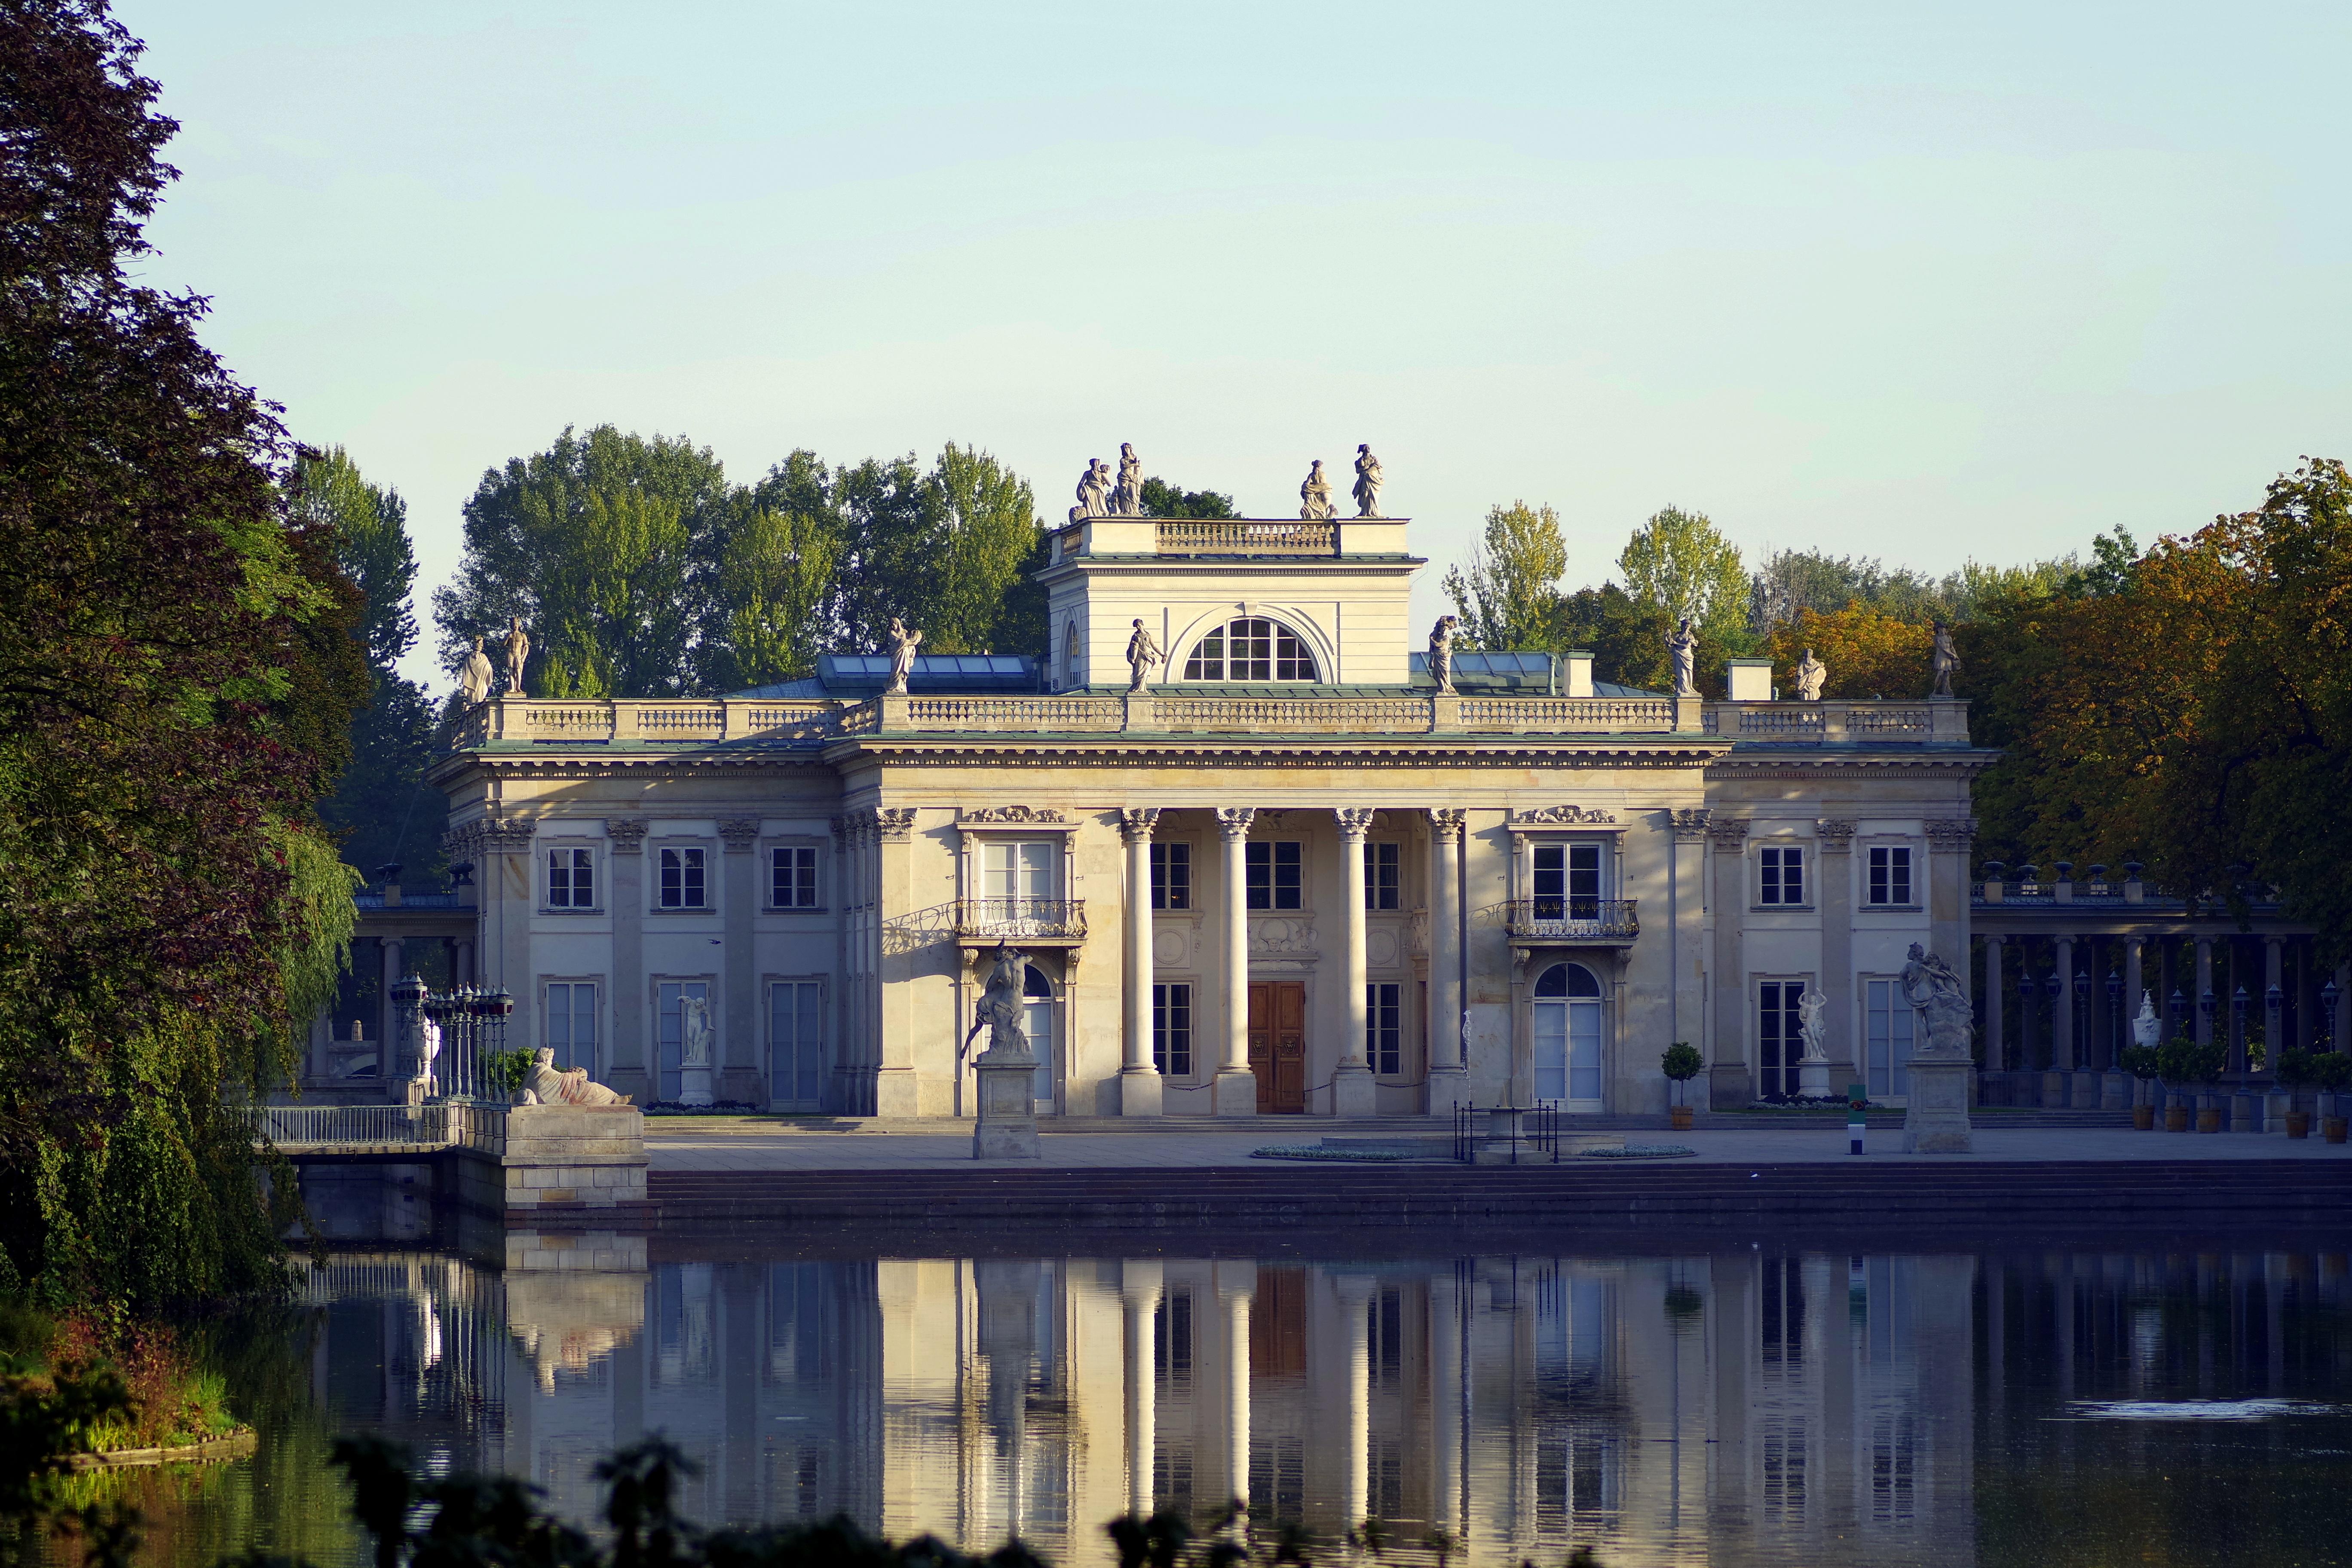 Free Images : architecture, mansion, house, building, chateau, monument, pond, reflection, landmark, facade, tourism, waterway, sculpture, tour, columns, ...